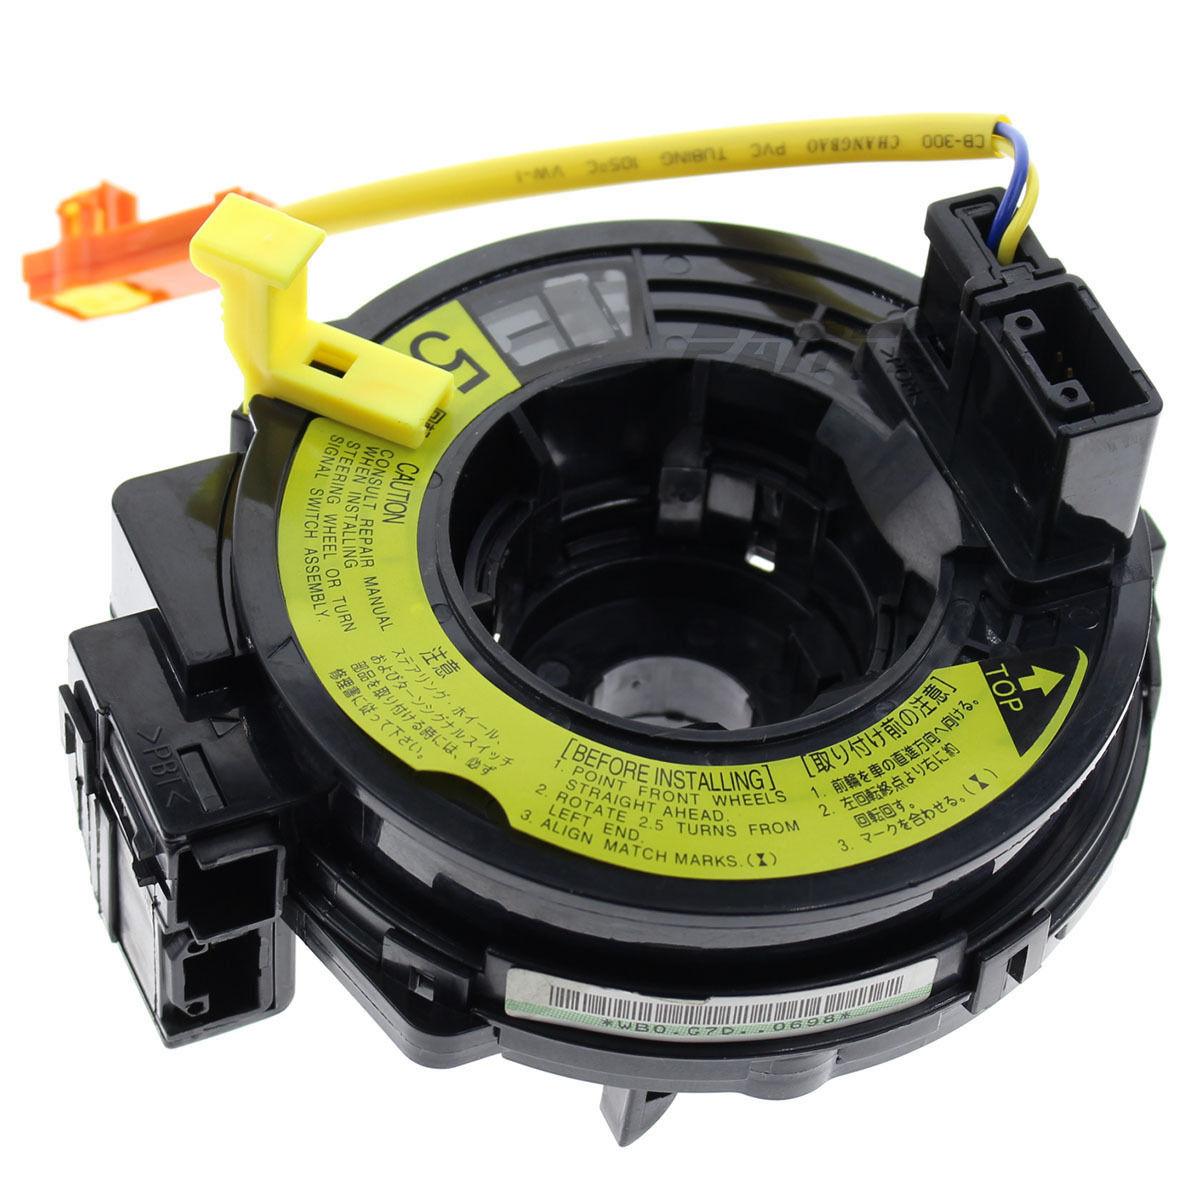 Toyota Srs 4runner Update Upcoming Cars 2020 Wiring Diagram Honda Mobilio 84306 52050 Airbag Clock Spring To Fit Rav4